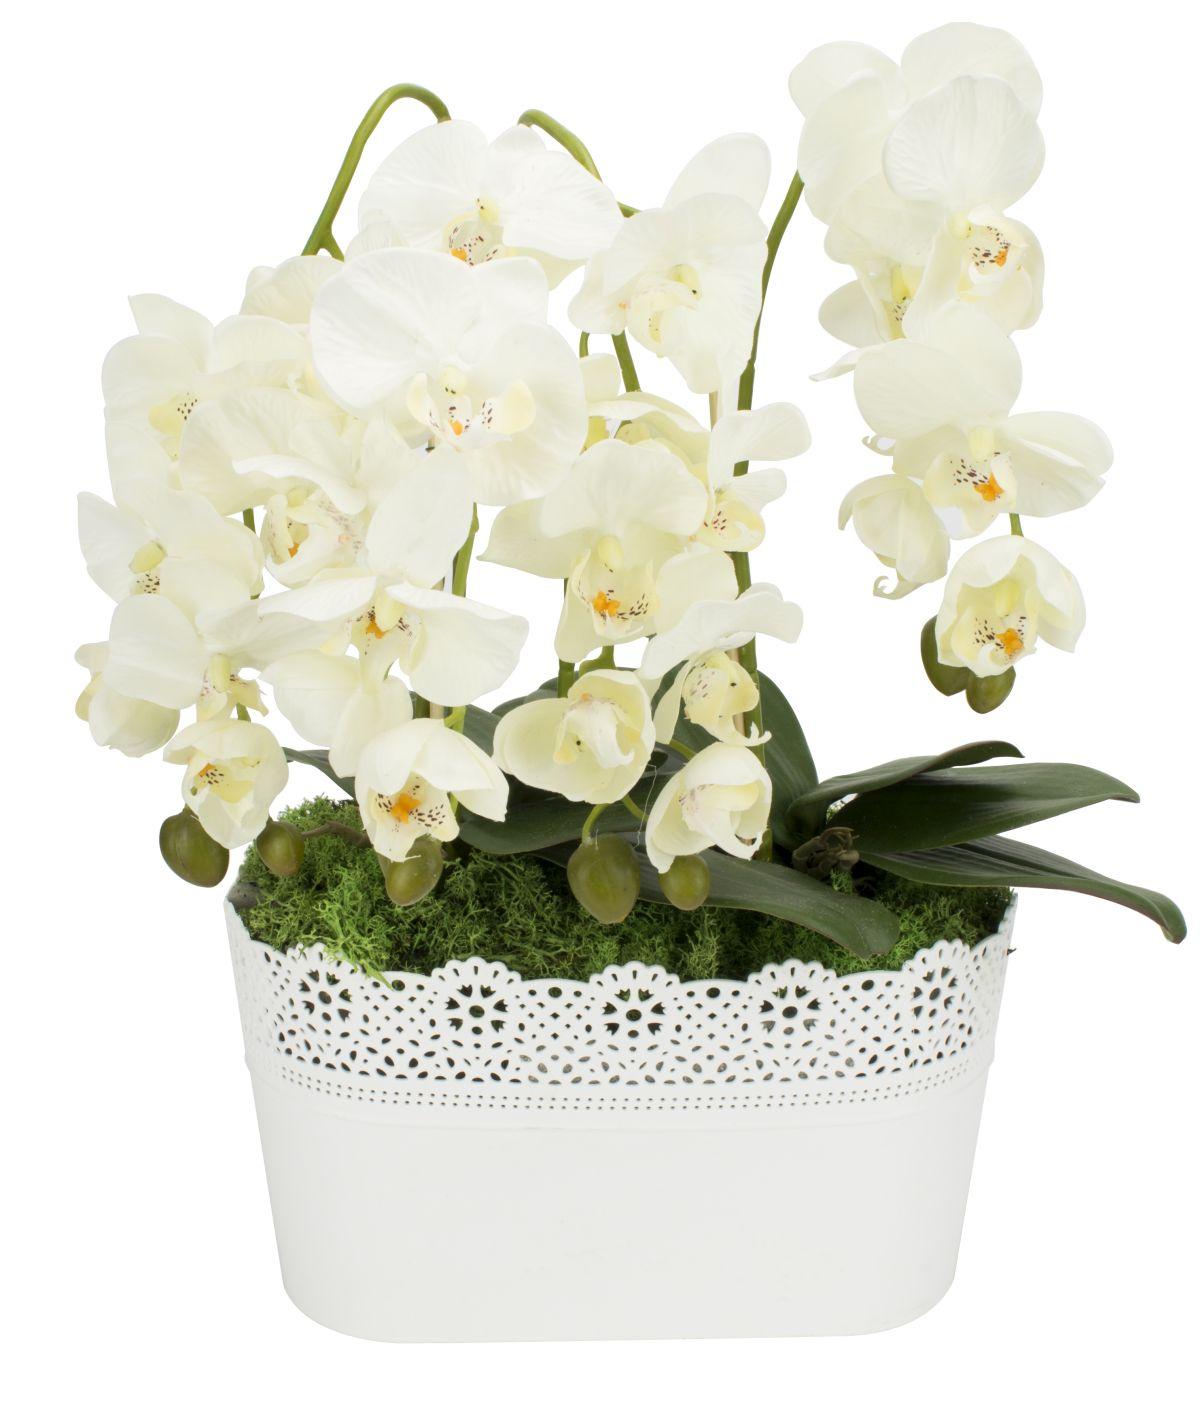 gesteck orchideen wei ecru kunstblumen fensterschmuck blumengesteck tisch deko ebay. Black Bedroom Furniture Sets. Home Design Ideas